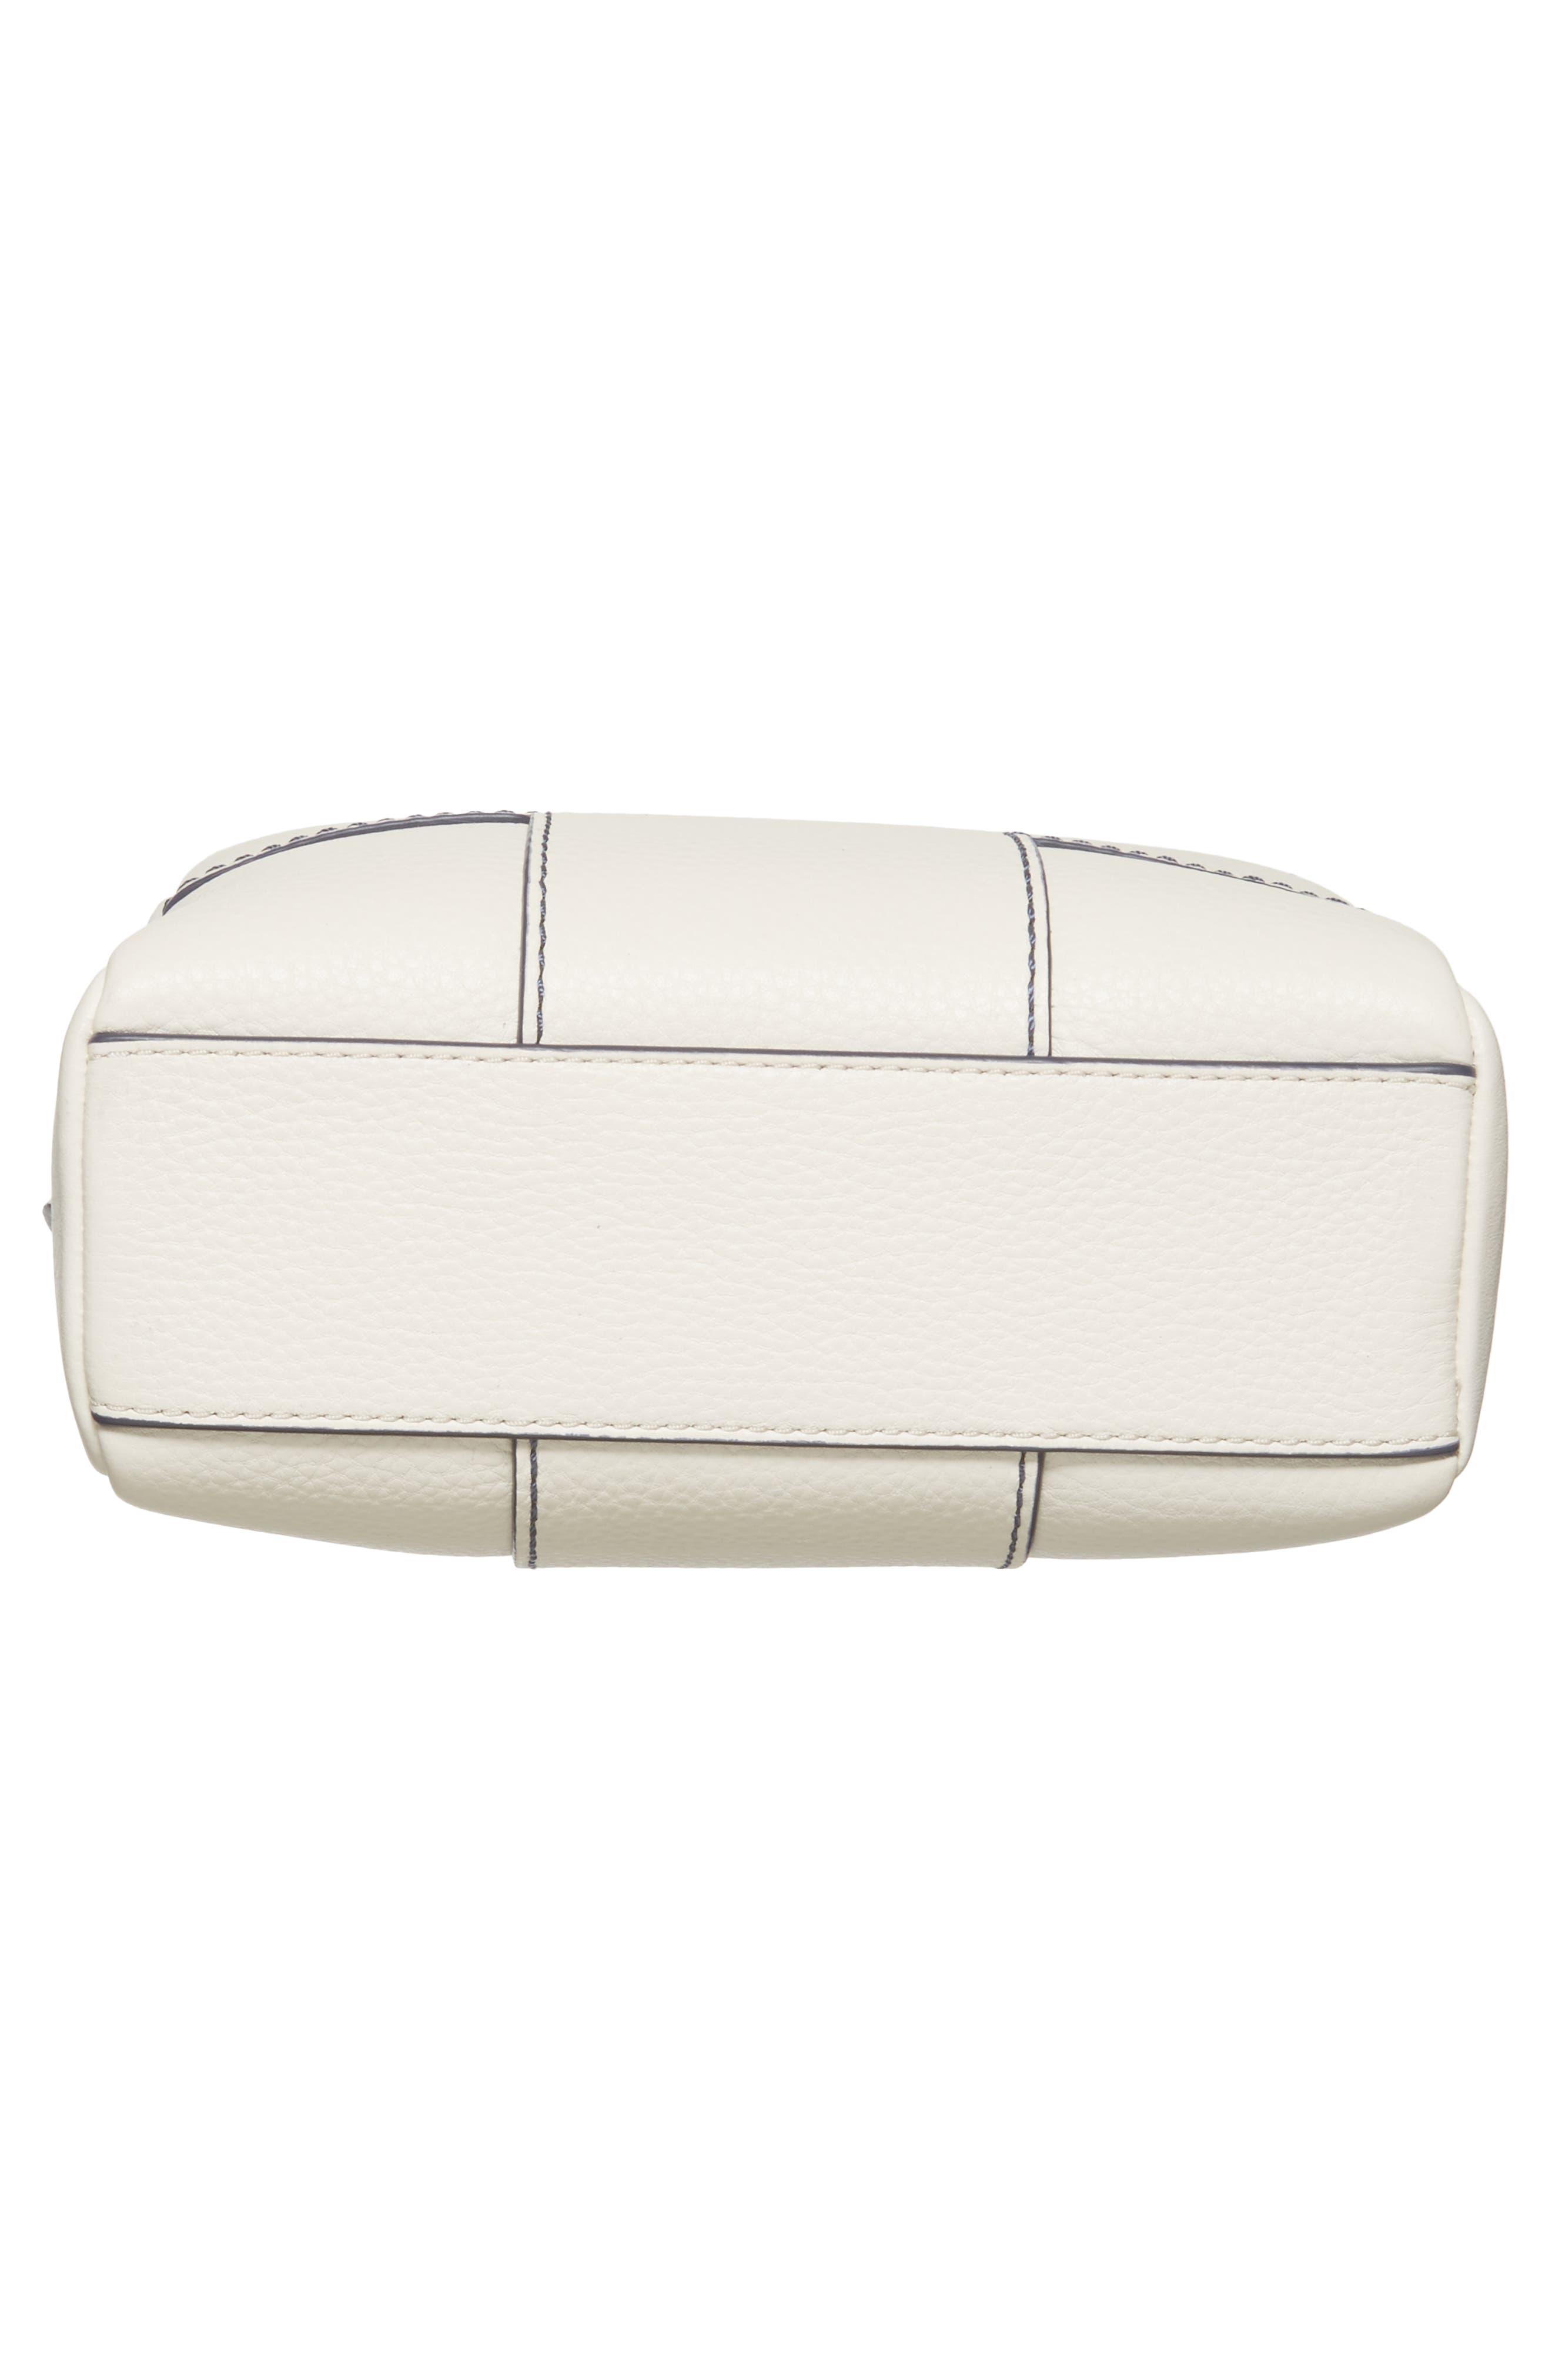 Block-T Double Zip Leather Crossbody Bag,                             Alternate thumbnail 6, color,                             100